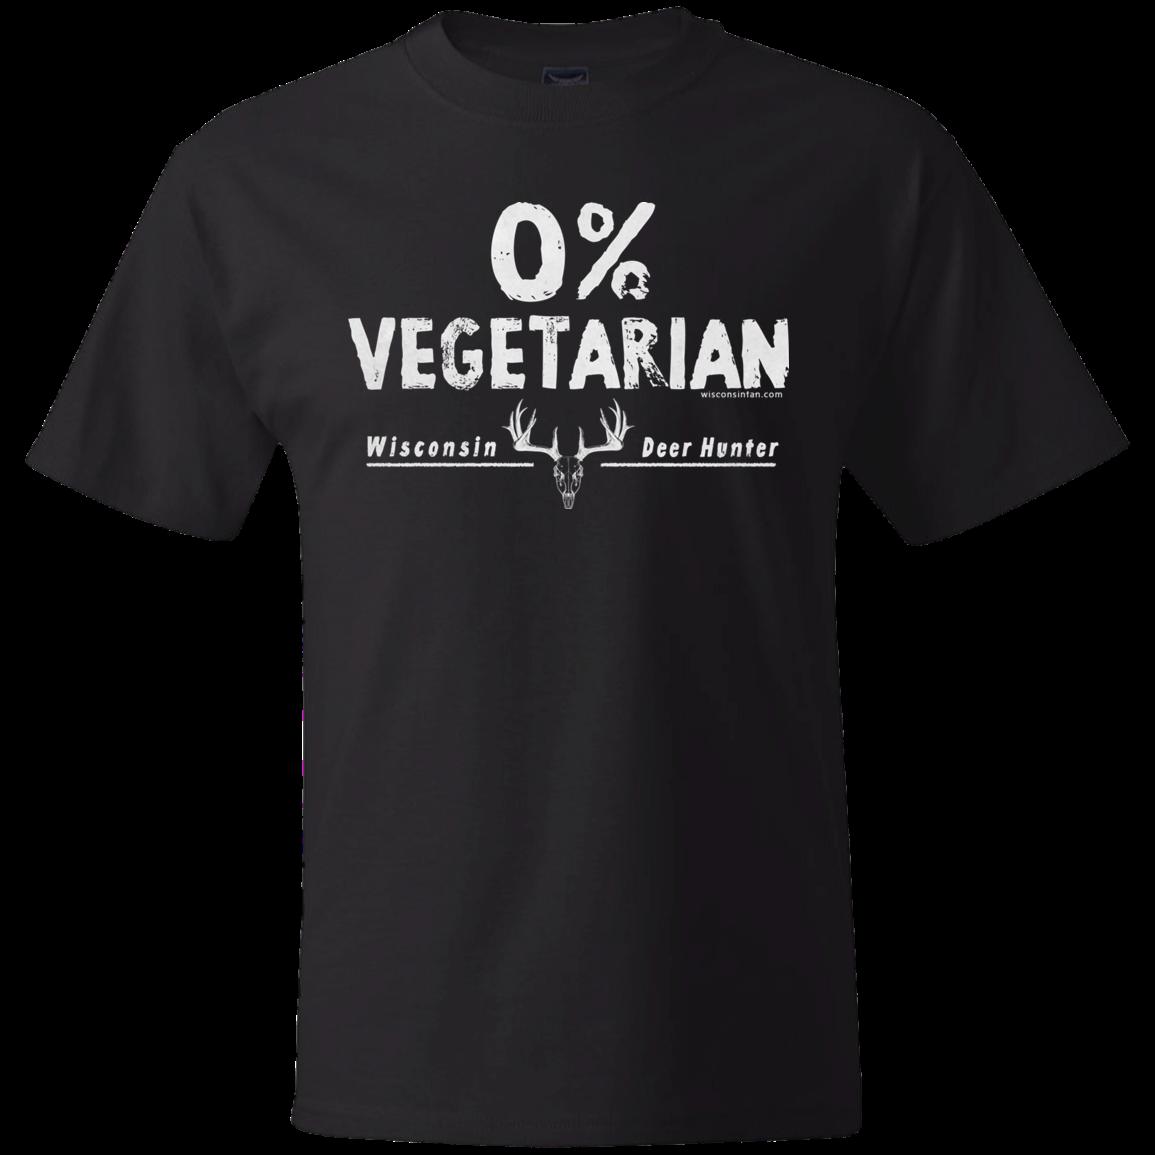 WisconsinFan 0% Vegetarian Mens Tshirt Tank